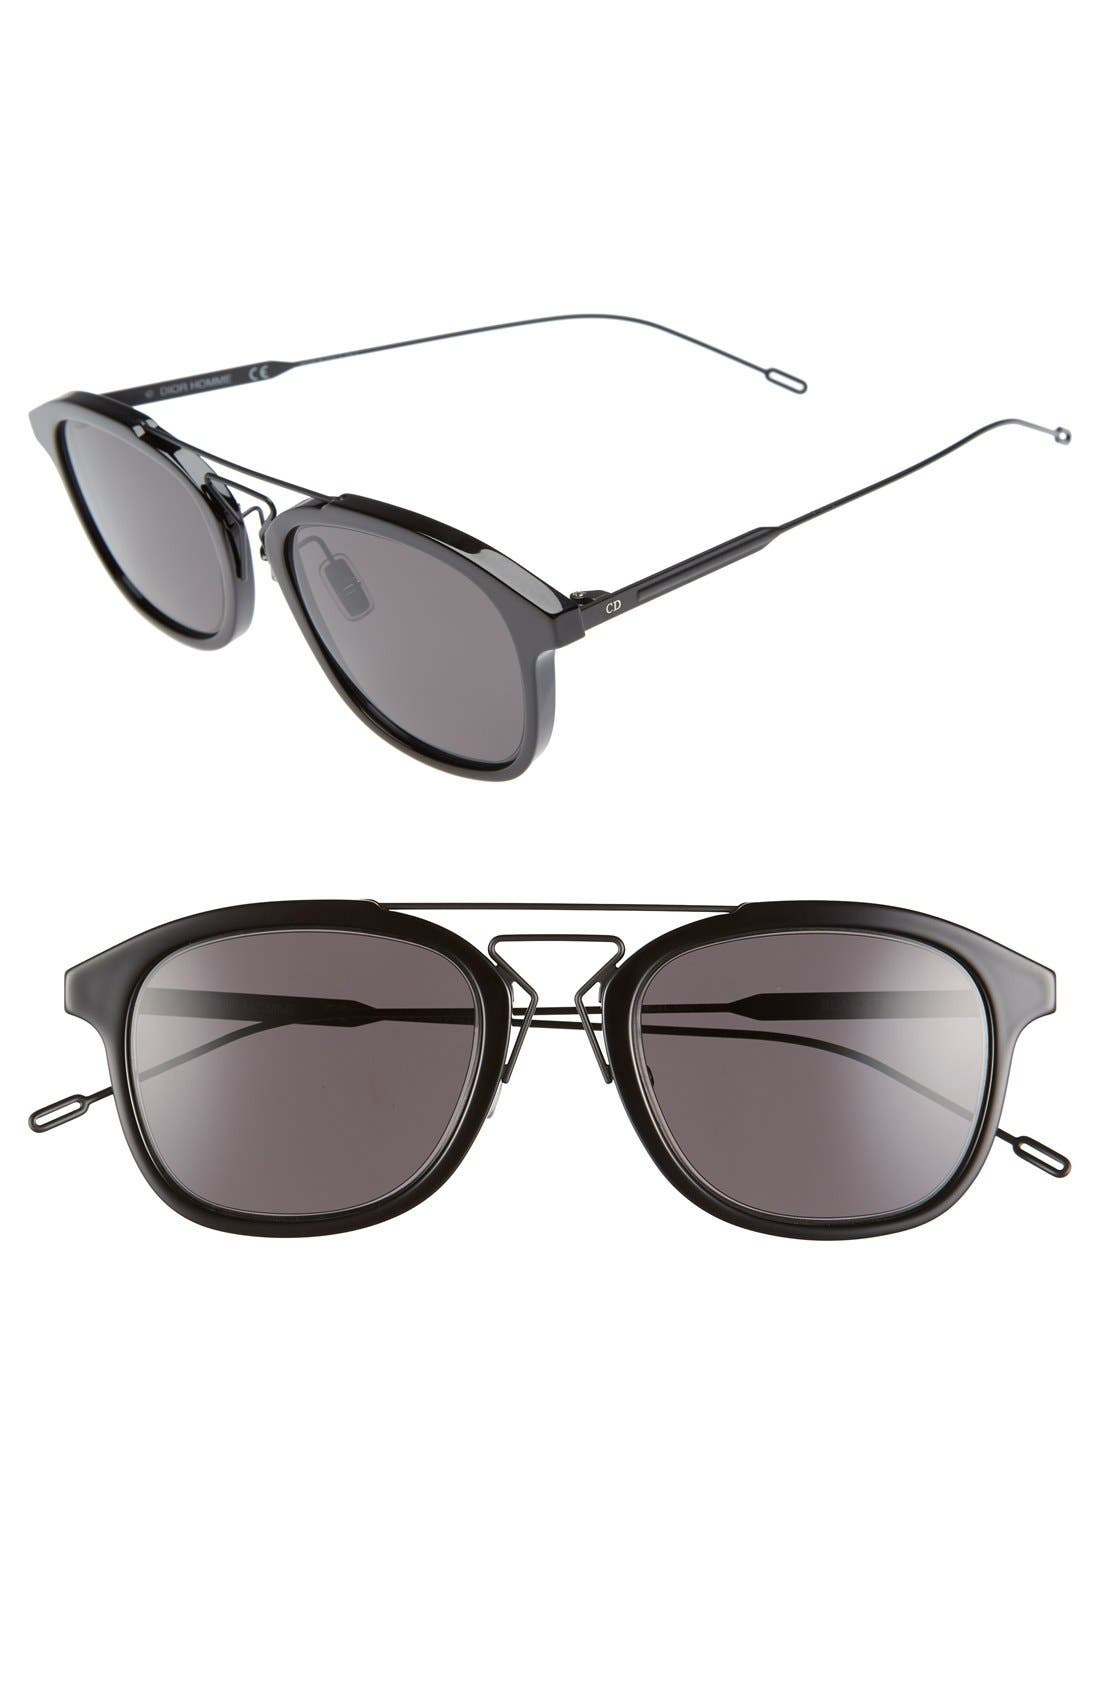 Alternate Image 1 Selected - Dior Homme 52mm 'Black Tie' Sunglasses